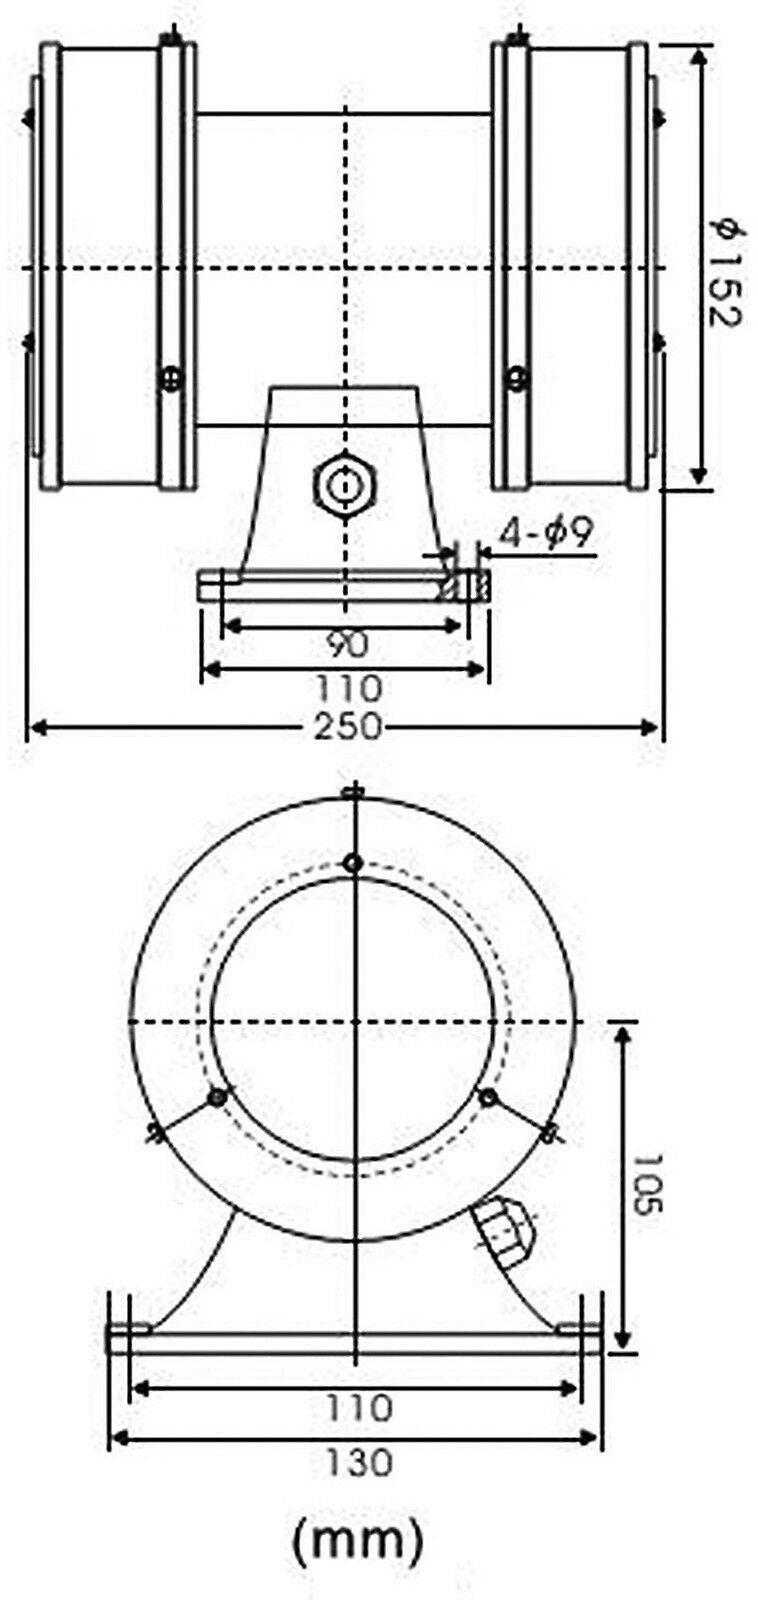 [HC_1580] Brake Line Diagram On 2002 Chevy Silverado